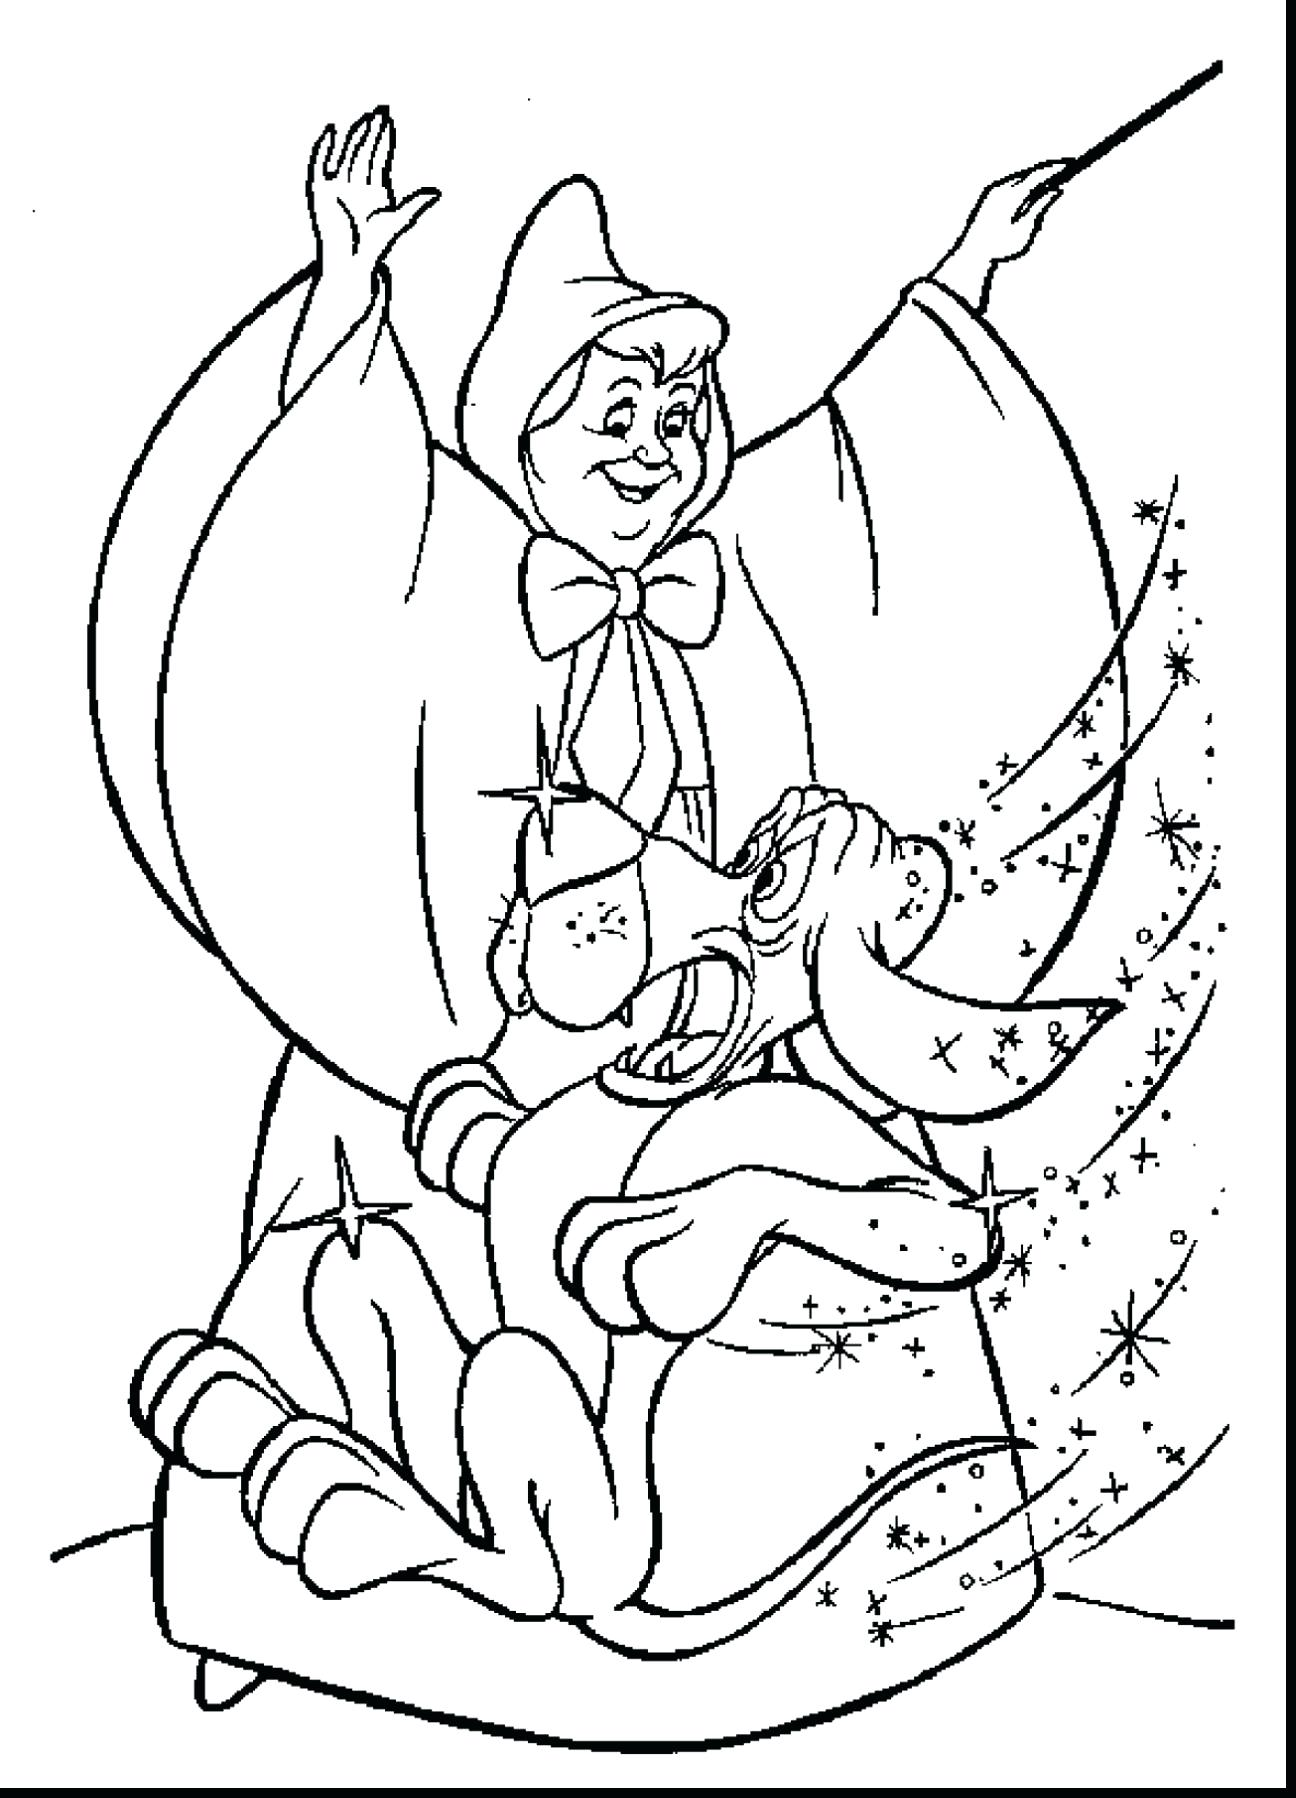 1296x1798 Coloring Pages Amusing Cinderella Castle Coloring Pages. Disney